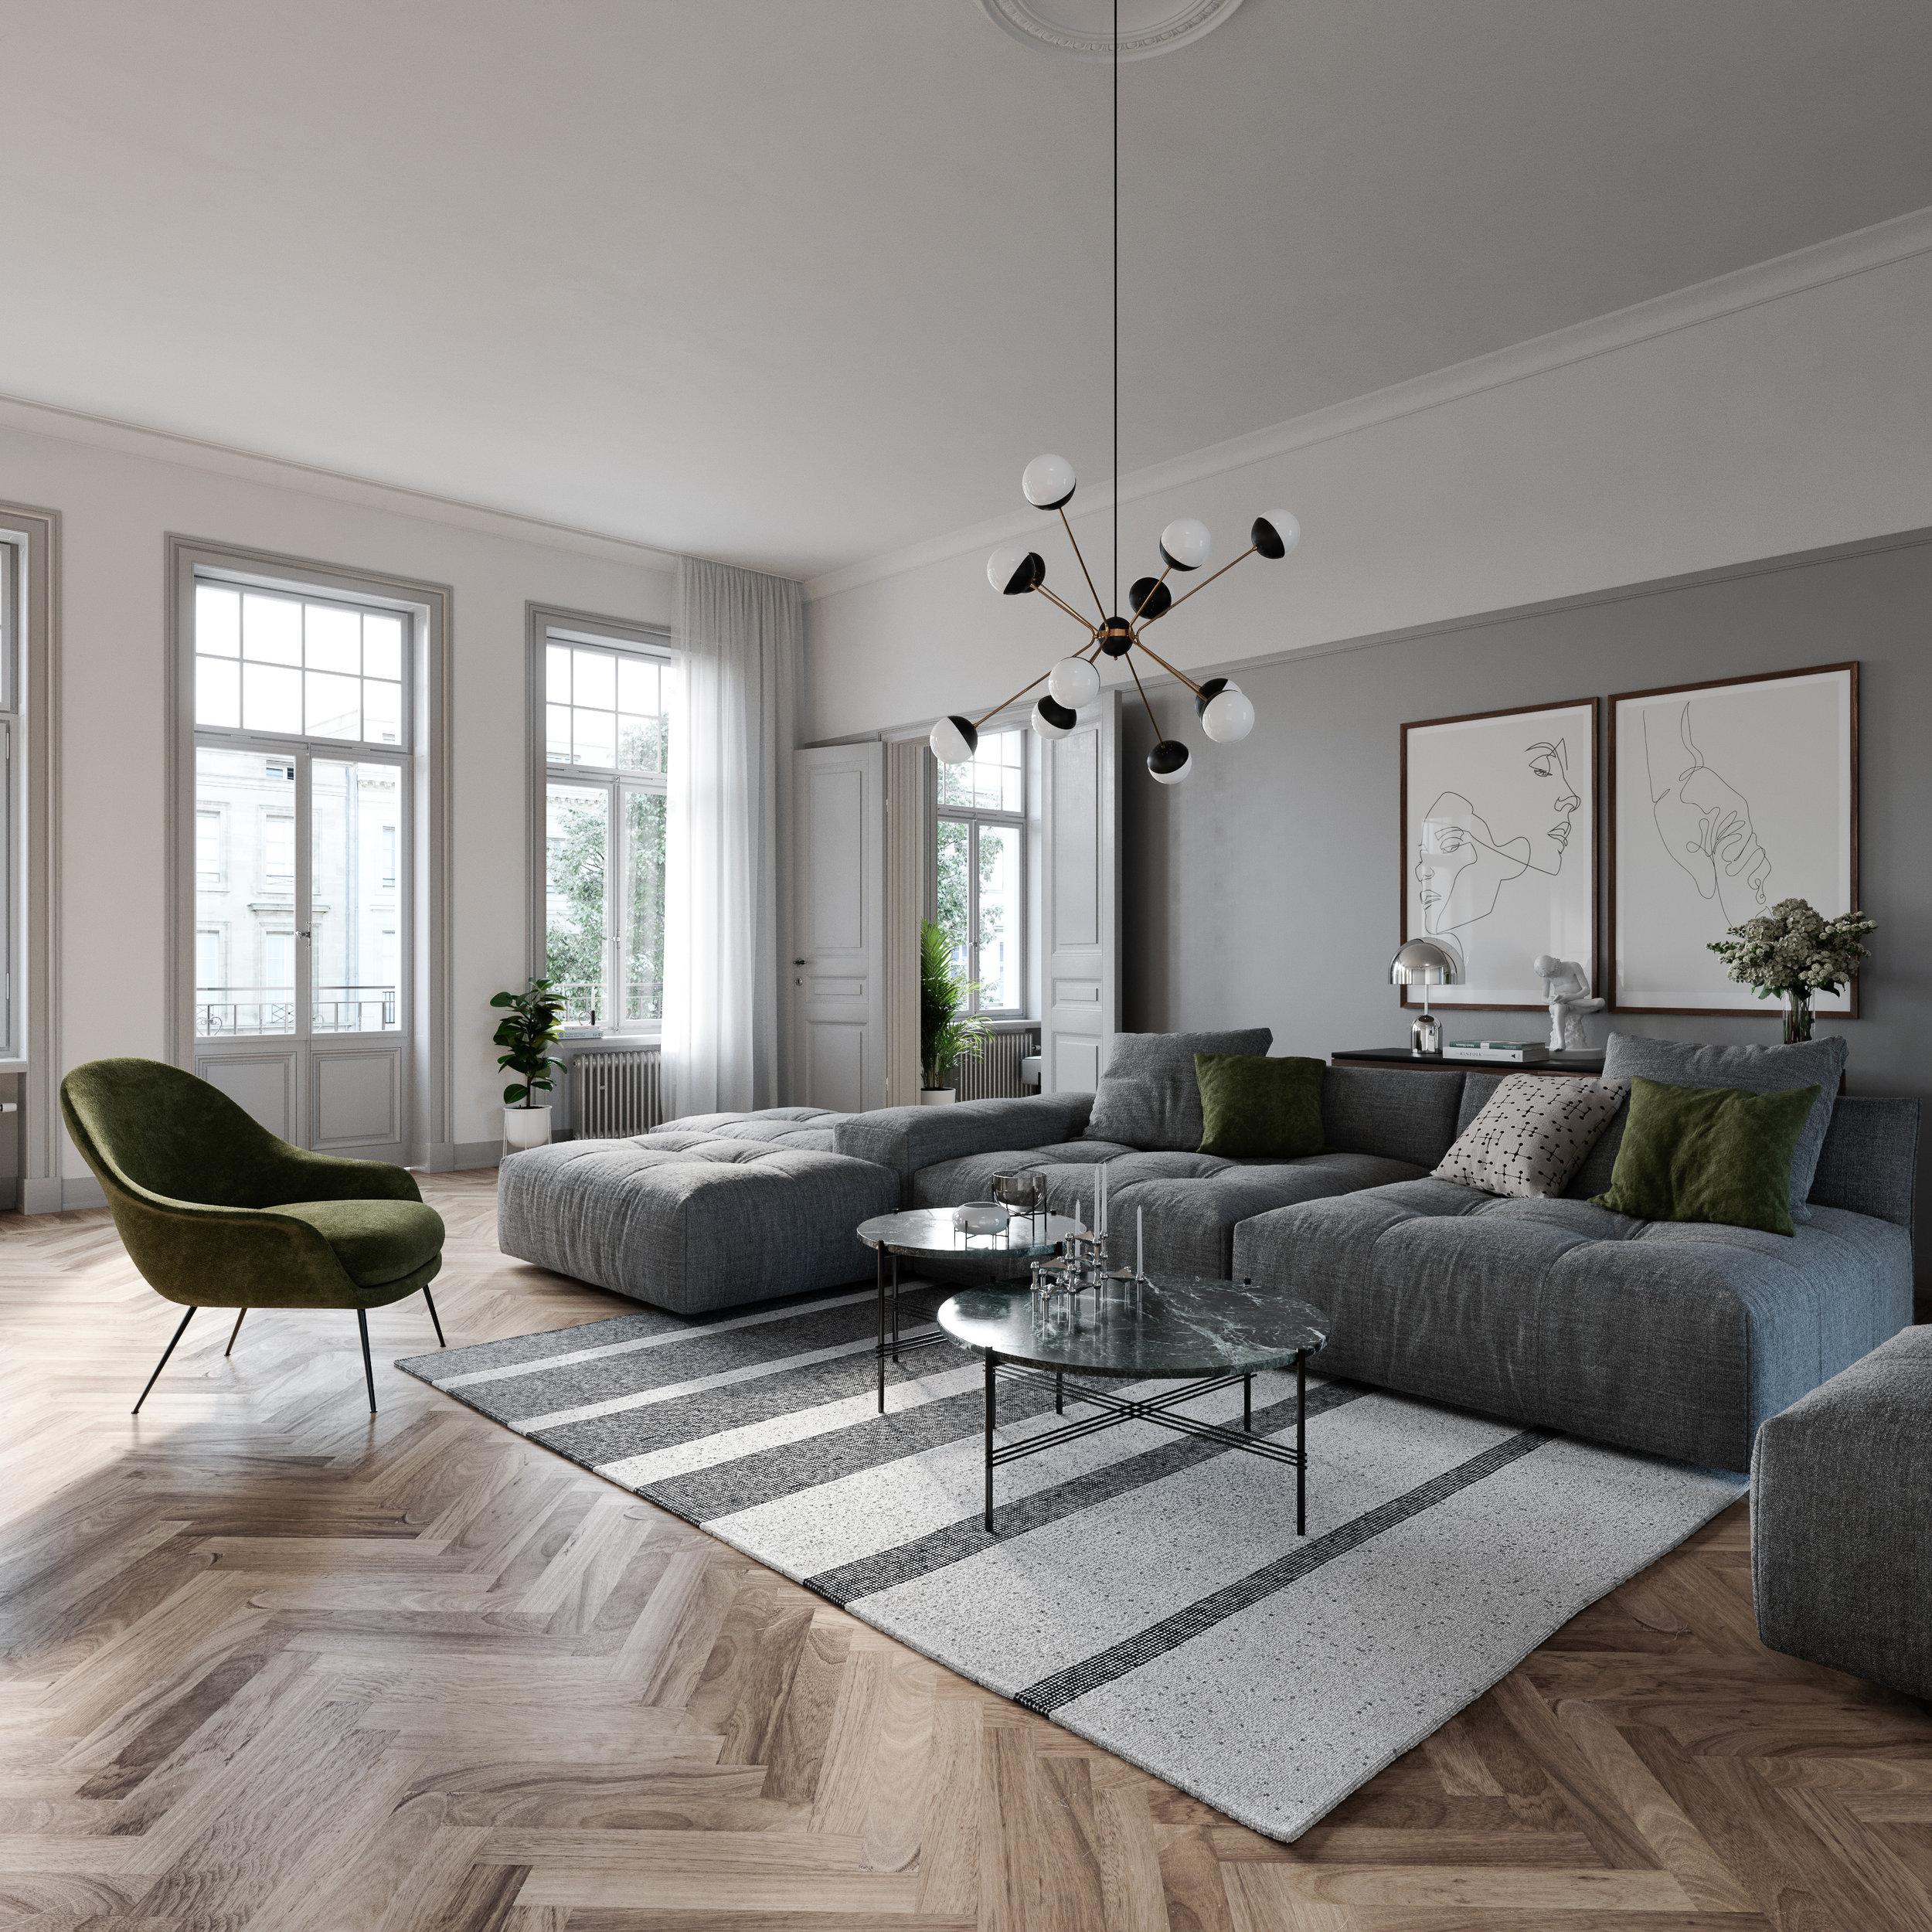 Cam_Livingroom_01_final.jpg